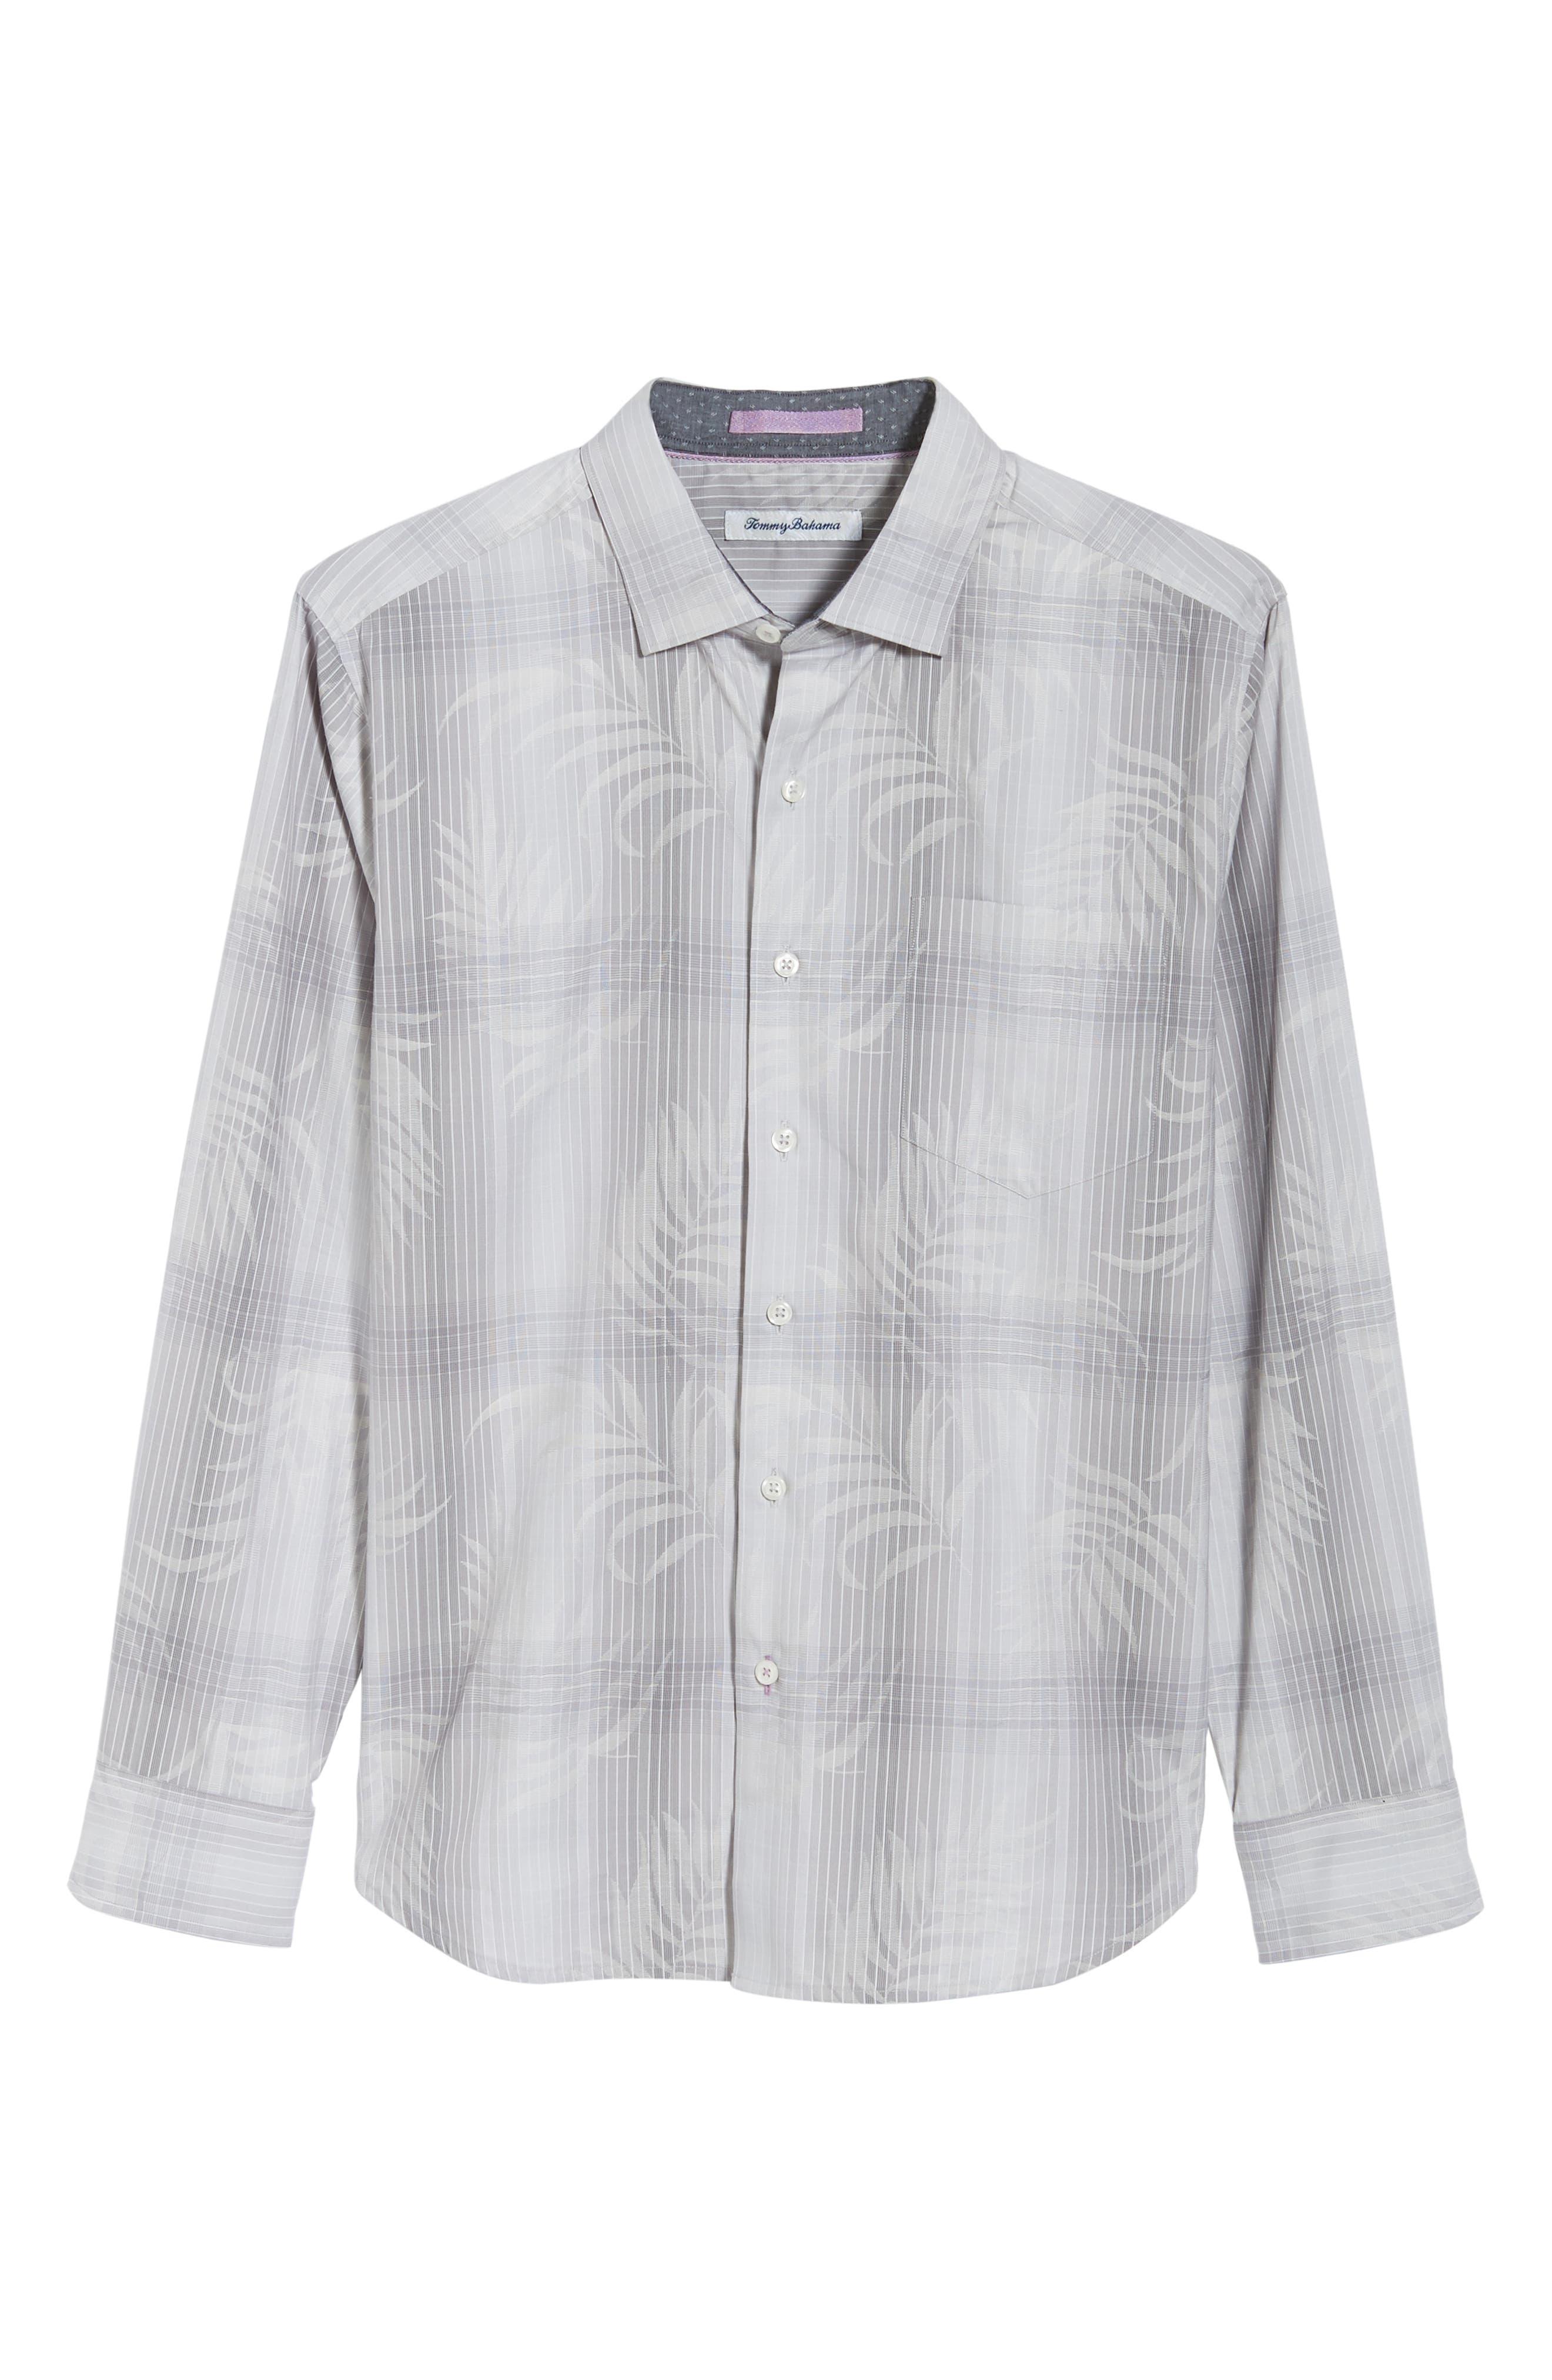 Primo Palms Regular Fit Plaid Sport Shirt,                             Alternate thumbnail 6, color,                             MICRO CHIP